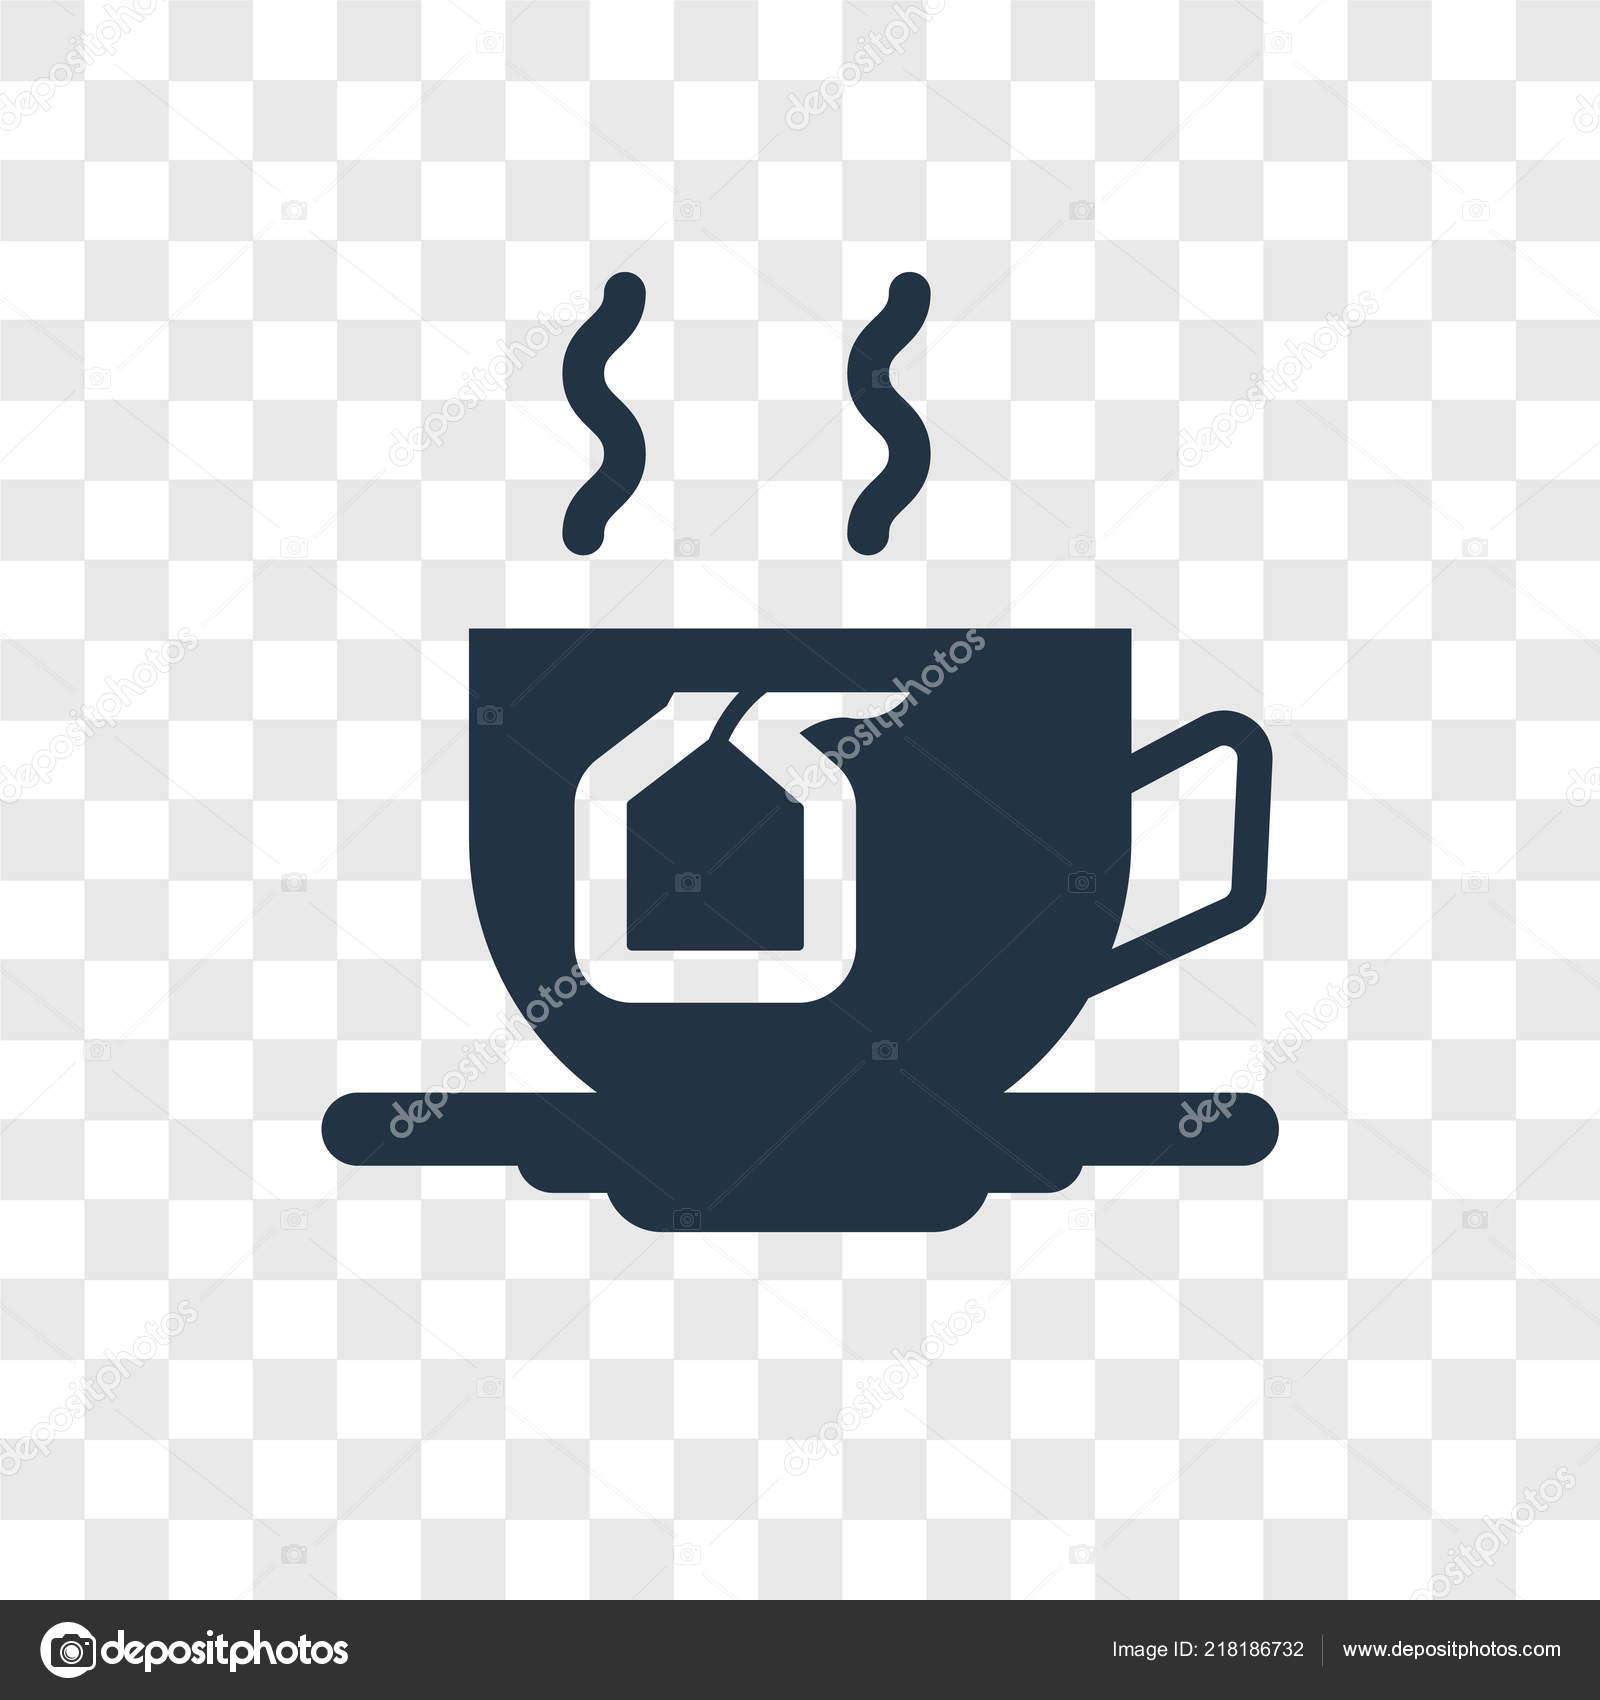 tea icon trendy design style tea icon isolated transparent background stock vector c topvectorstock 218186732 depositphotos